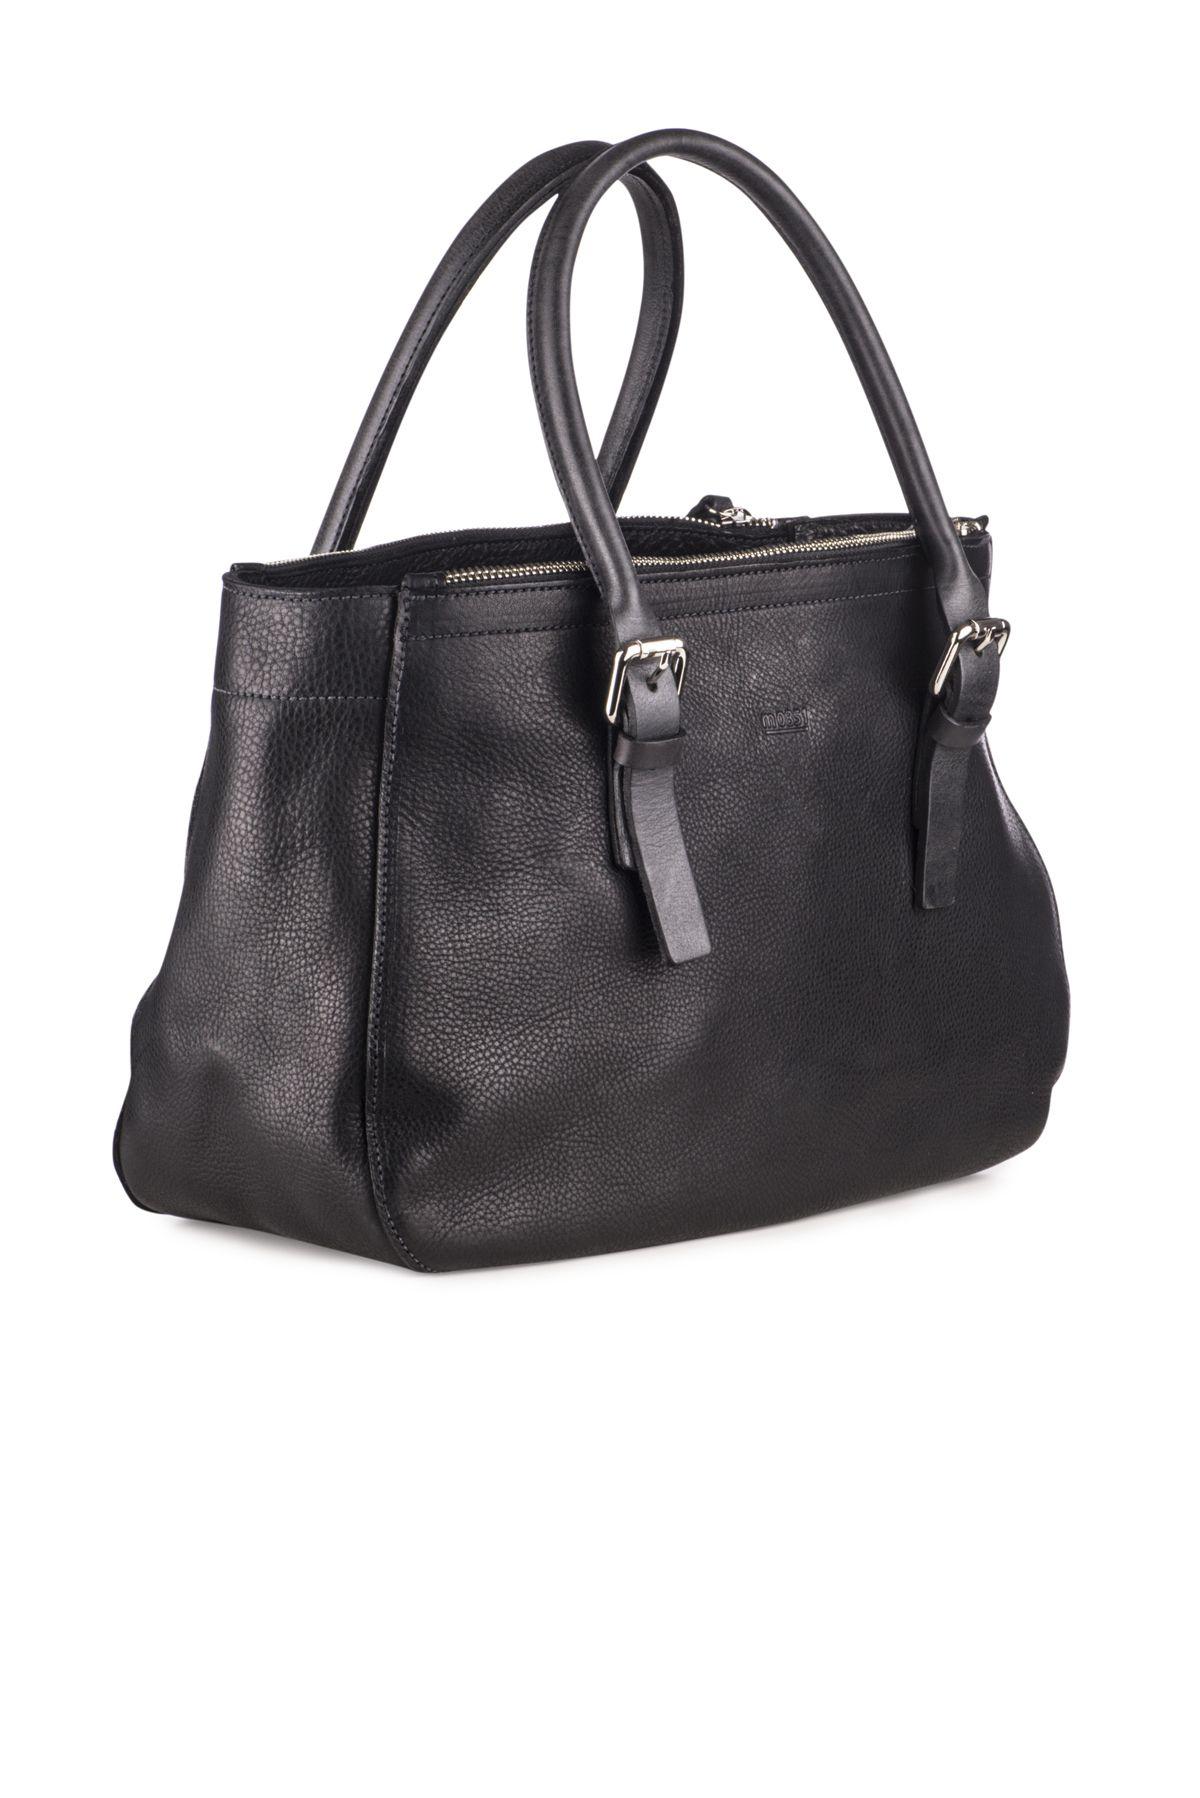 M0851 Petit Zip Double Bag  Shopafar  bag  accessories  fashion  leatehr   carryall  travel  handbag  m0851  mo851 b8fcae72ab1b6